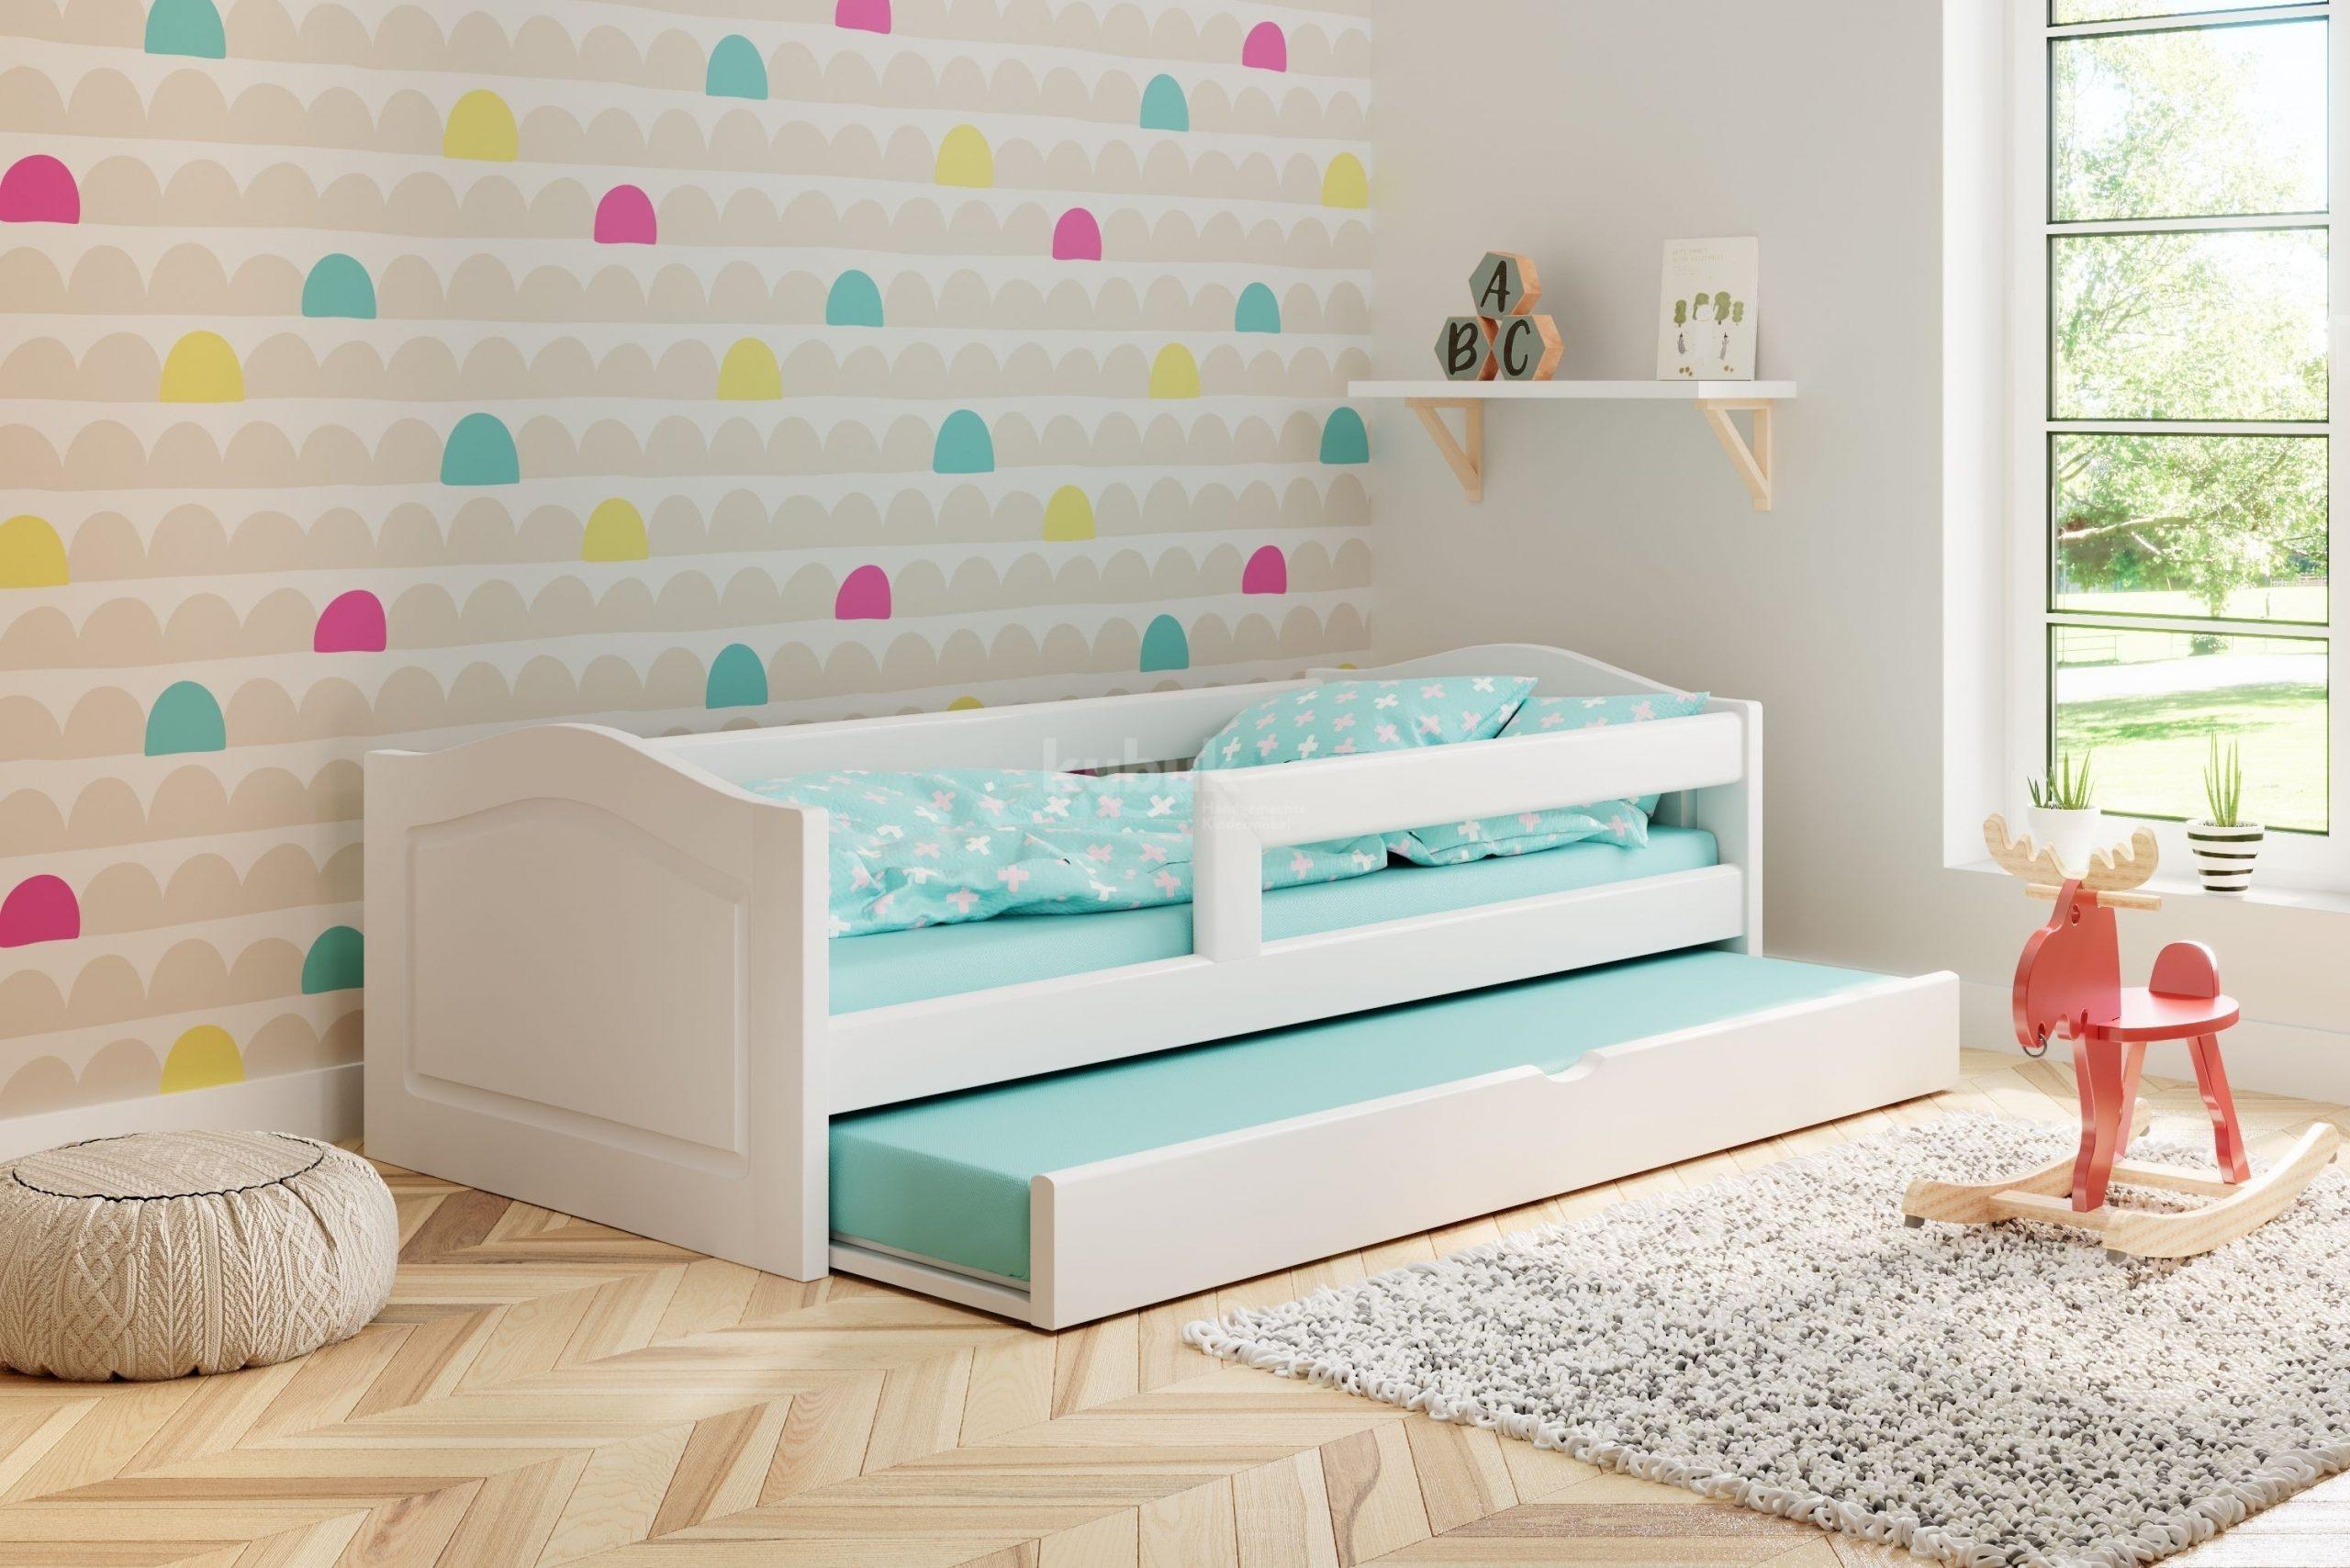 Full Size of Kinderbett Bett Mädchen Betten Wohnzimmer Kinderbett Mädchen